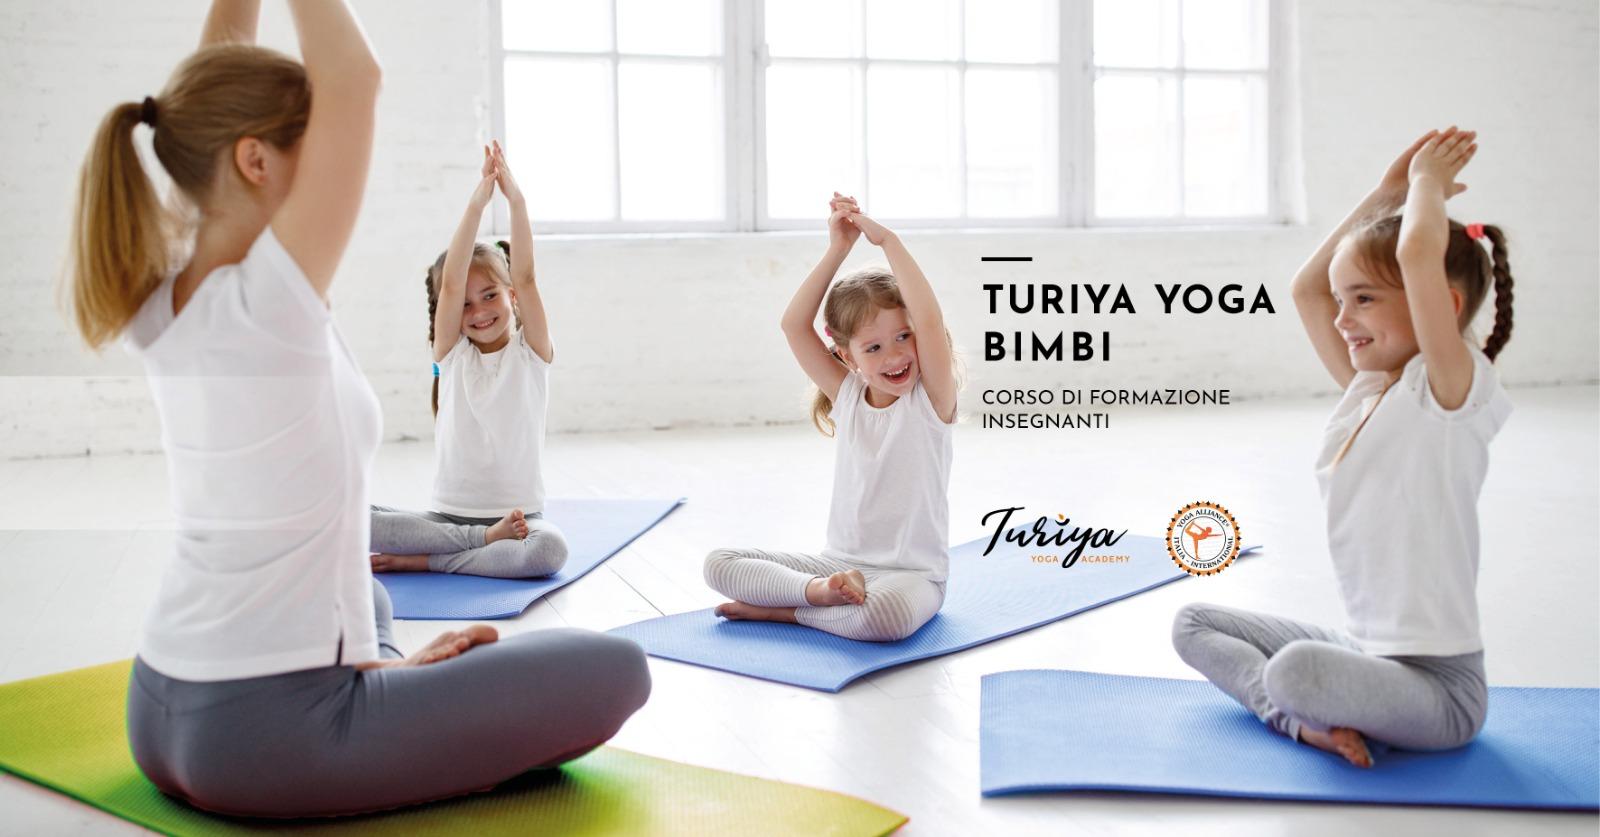 Turiya Yoga Bimbi